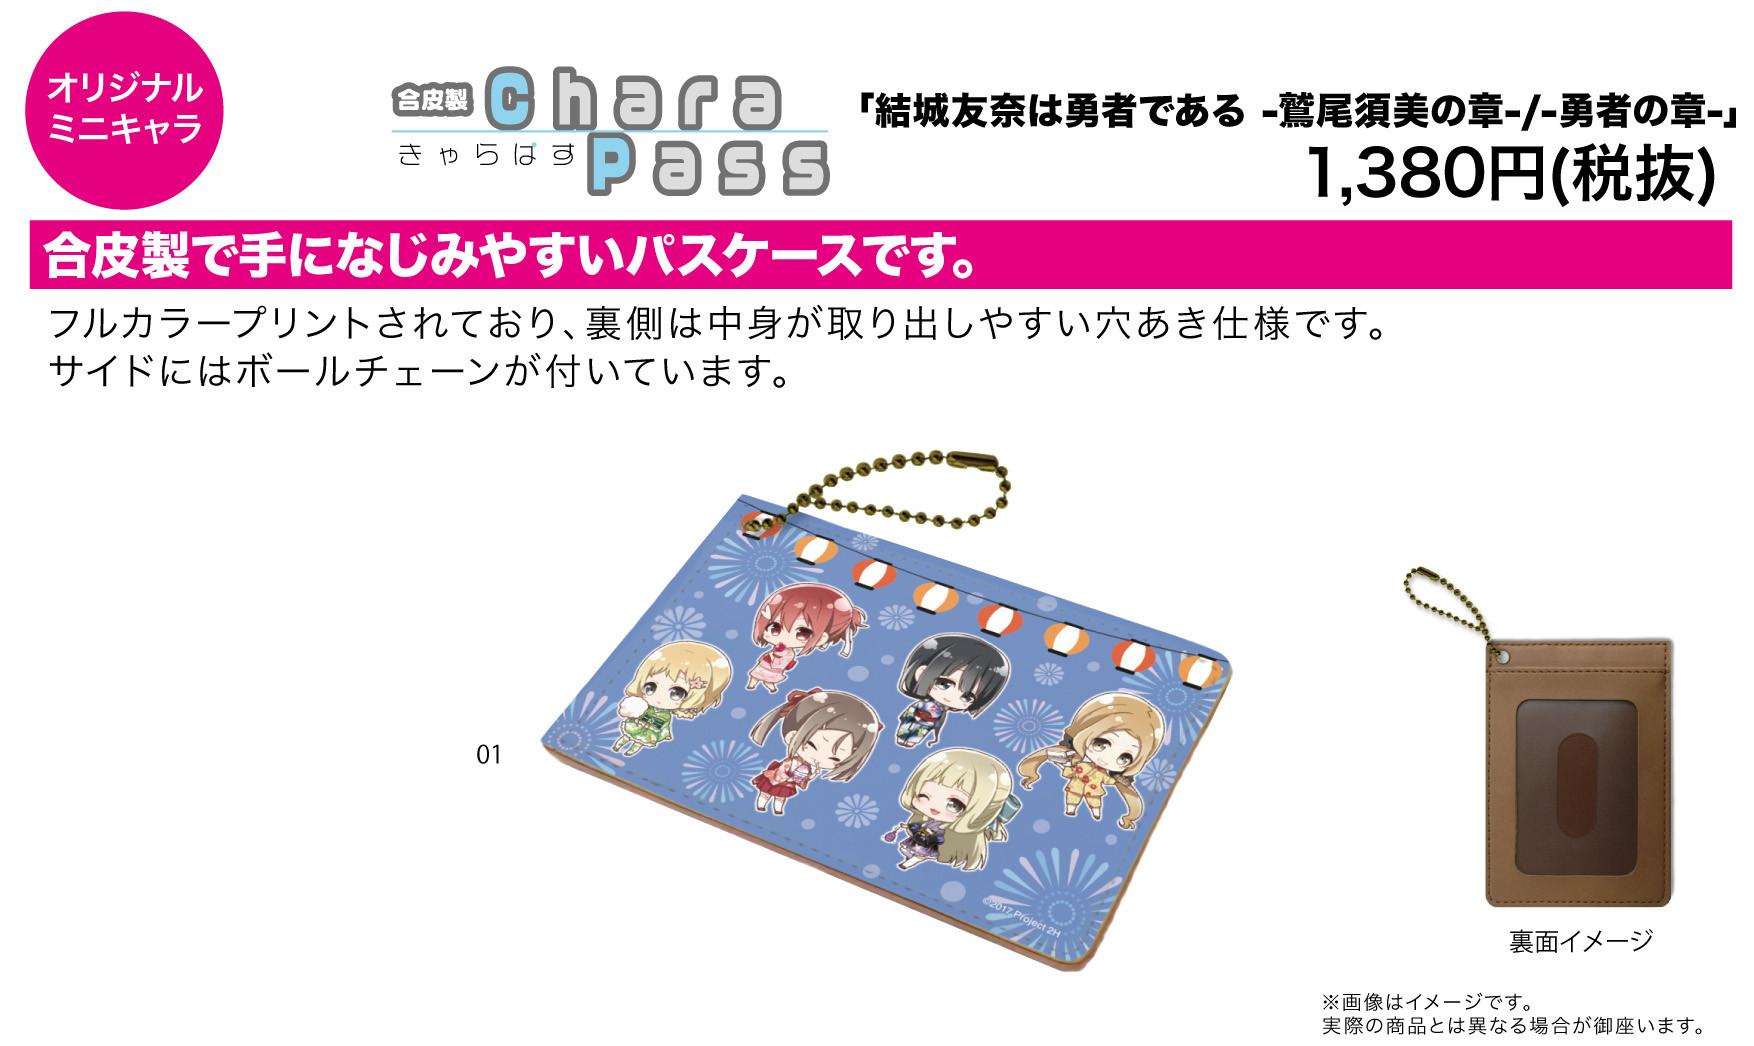 Chara Pass Case Yuki Yuna wa Yusha de Aru -Washio Sumi Chapter- / -Hero Chapter- 01 Group Design Festival (Mini Character)